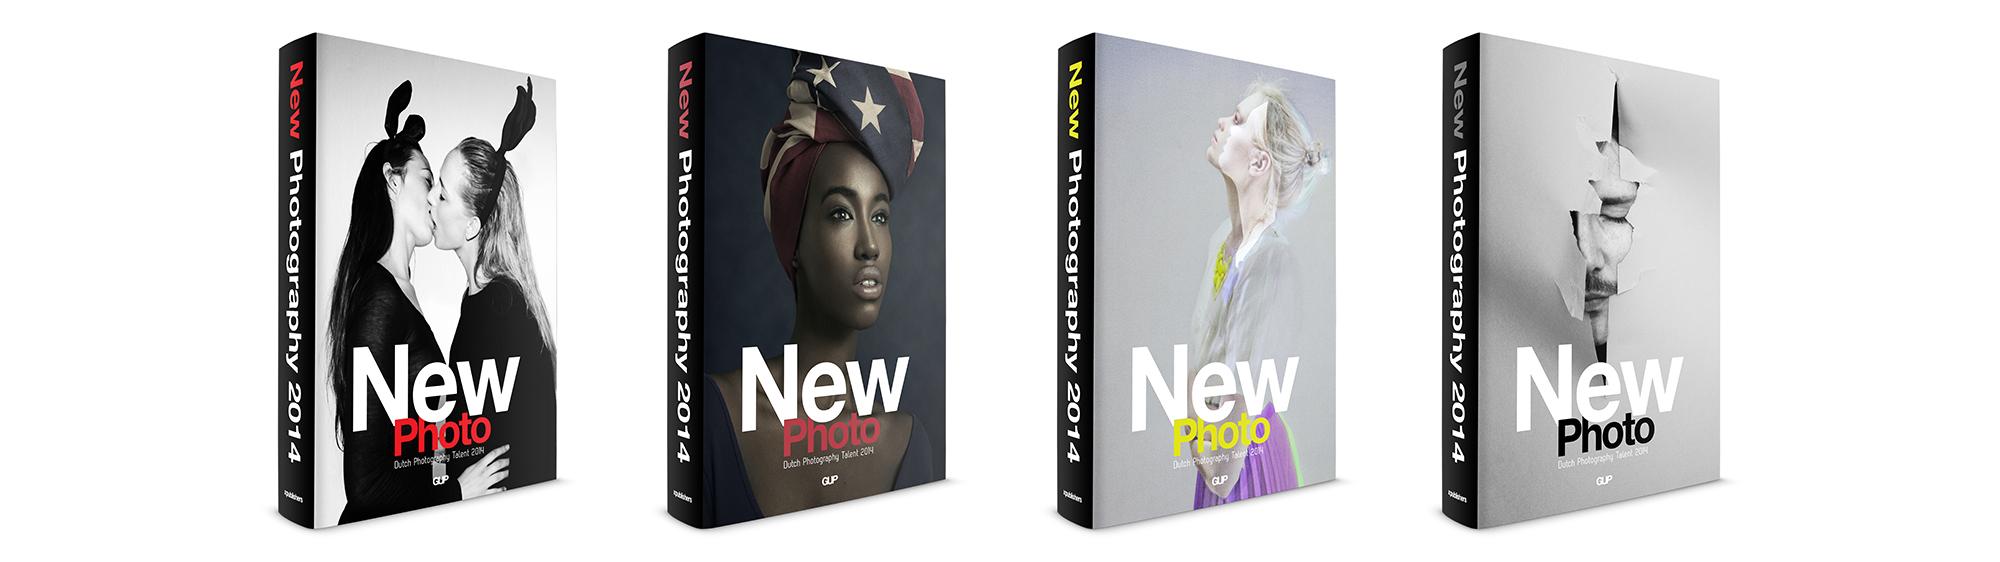 Foreword by Editorial Team  Cover images © Anne Barlinckhoff / Dirk Hardy/ José Pasmans /Sabine Perigault